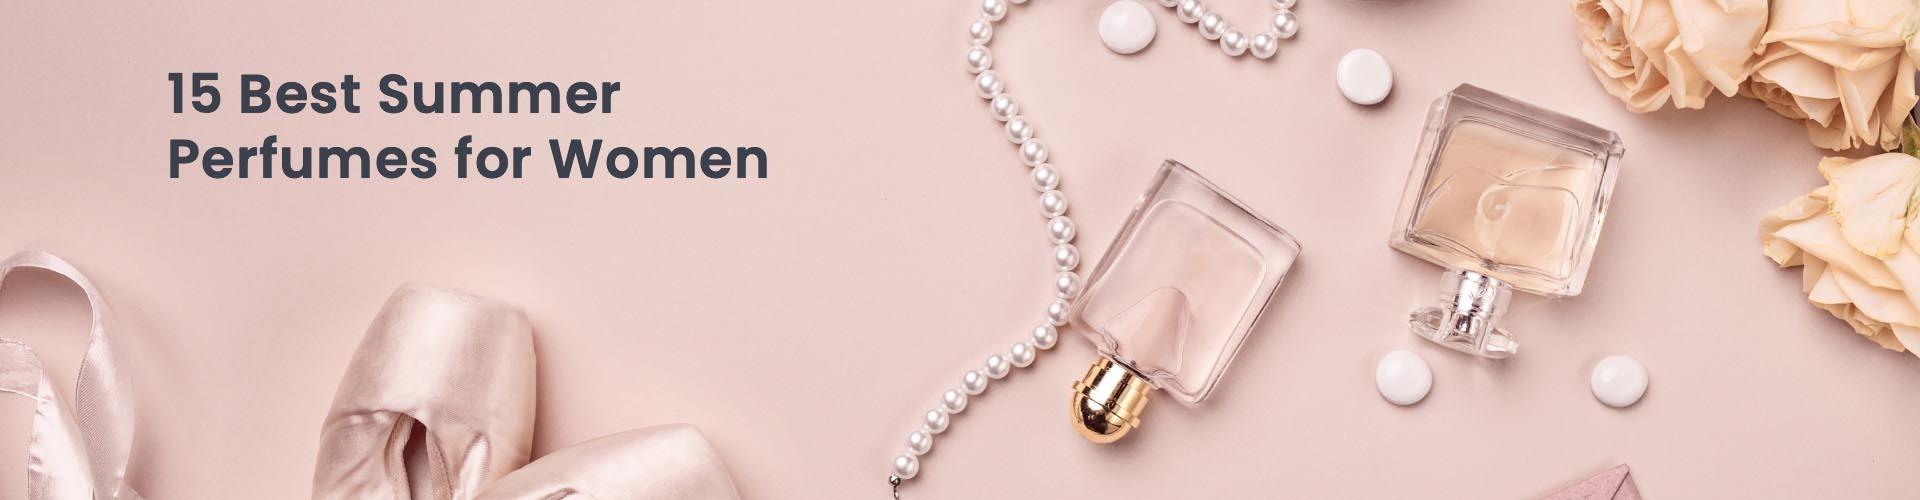 Best perfumes for women 2021 | Top long lasting fragrances in Nepal